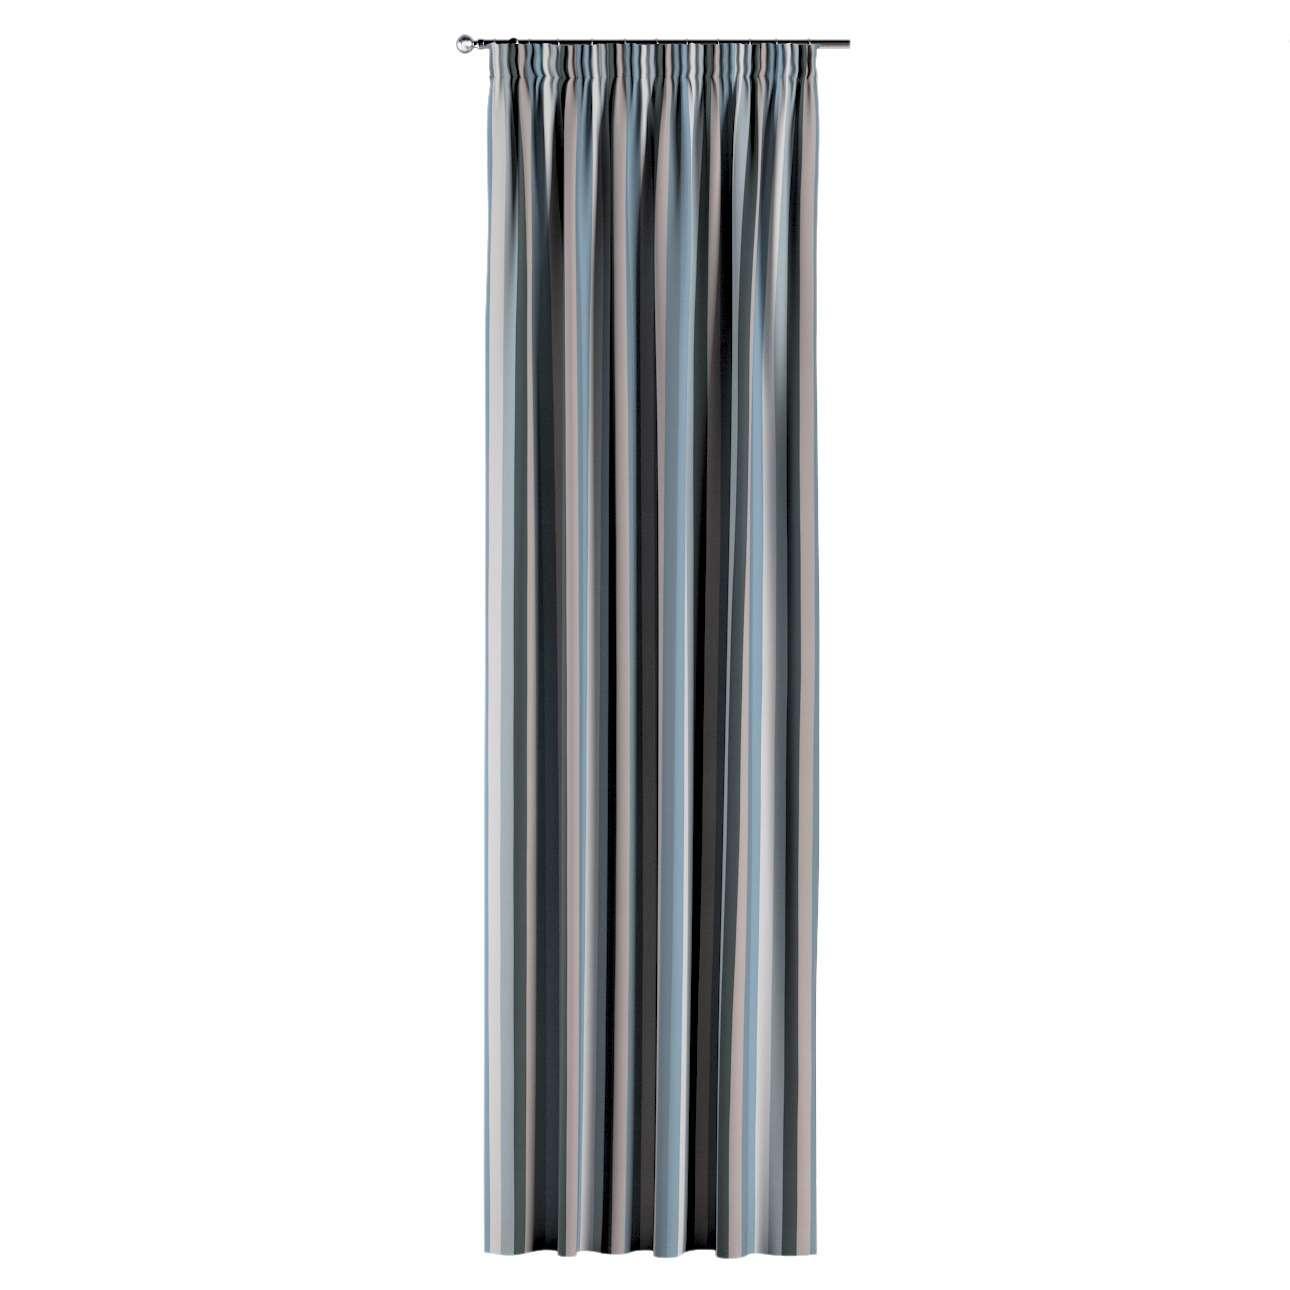 Gardin med rynkebånd 1 stk. fra kollektionen Vintage 70's, Stof: 143-57